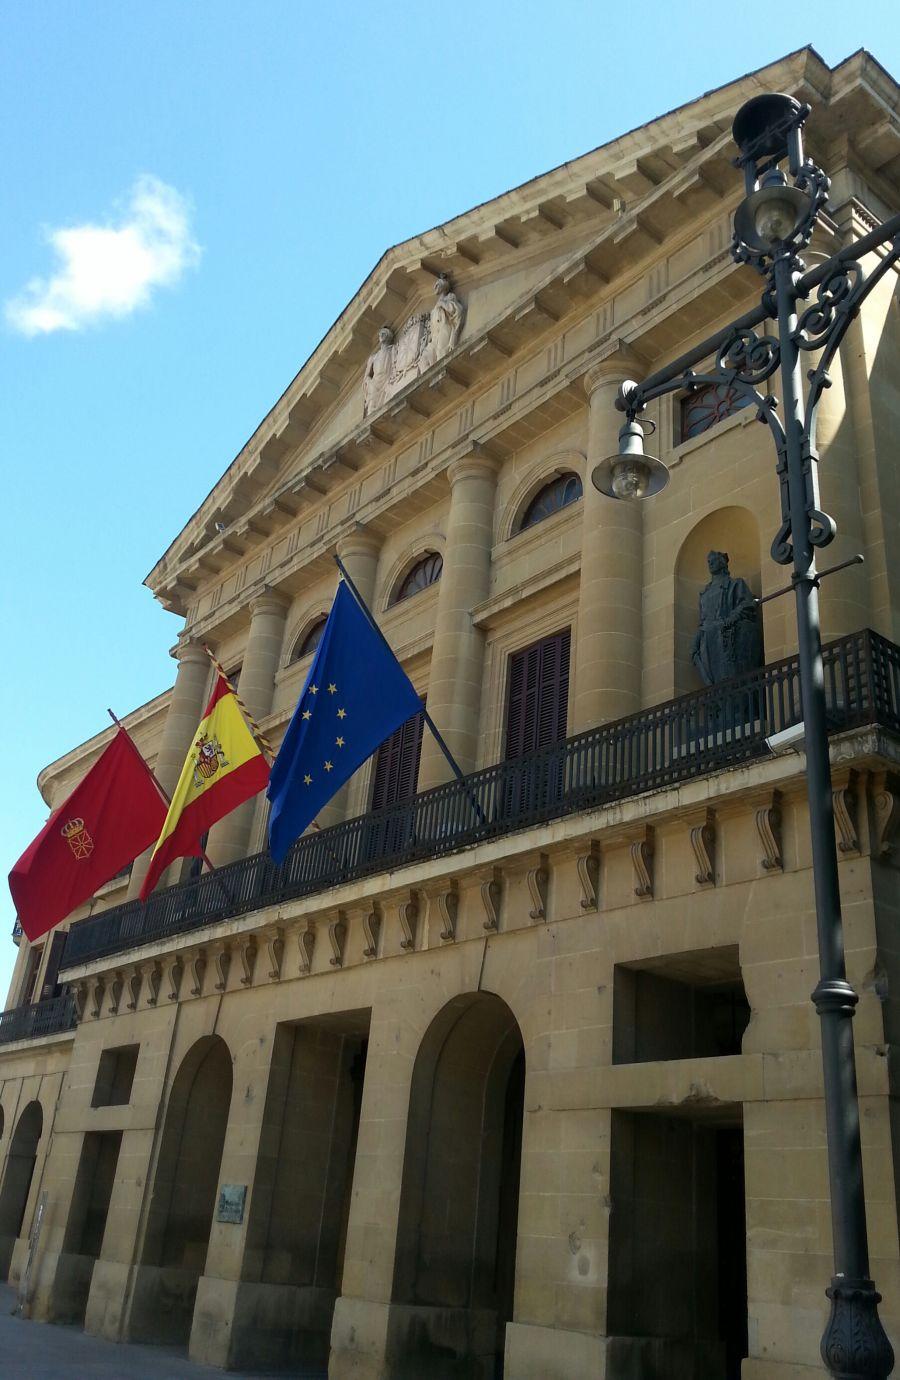 Navarra concede 1,1 millones a 48 ayuntamientos por exención de contribución o IBI